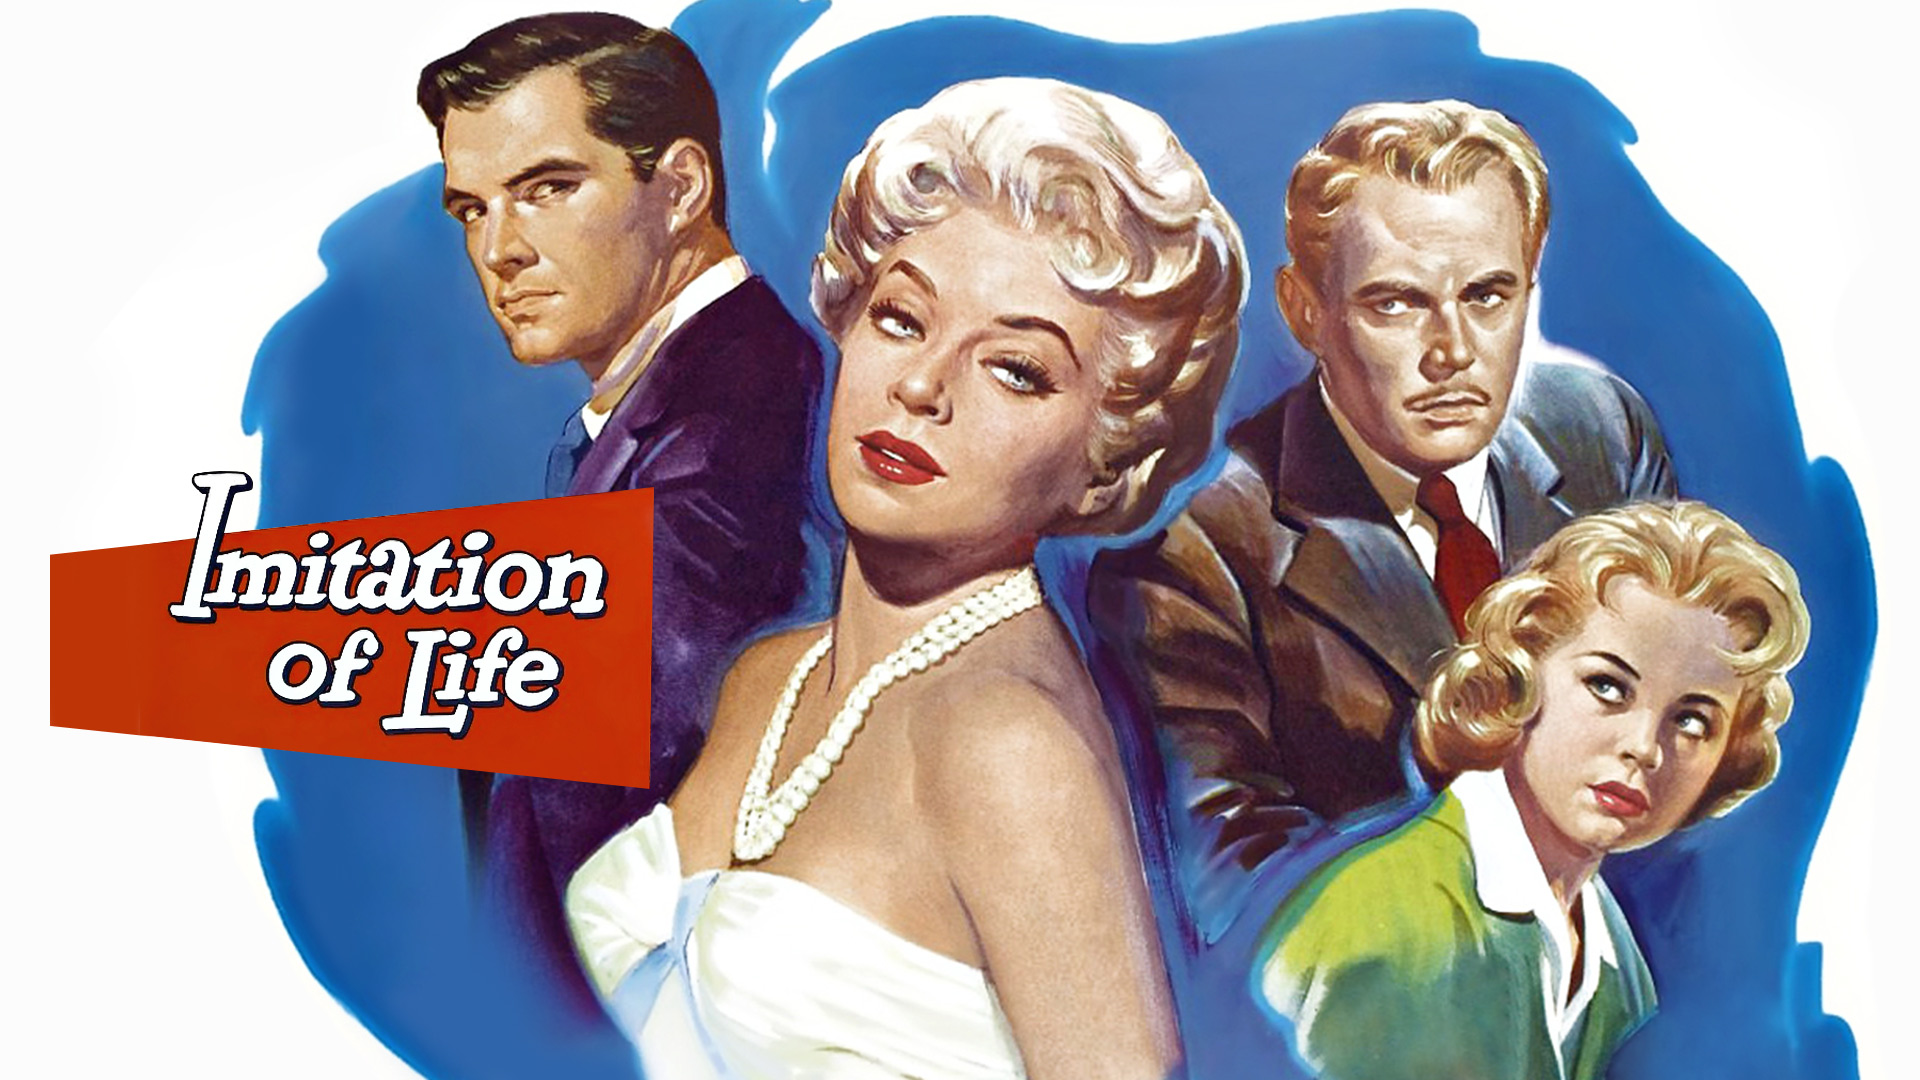 IMITATION OF LIFE 1959 Universal-International film with Lana Turner Stock  Photo - Alamy